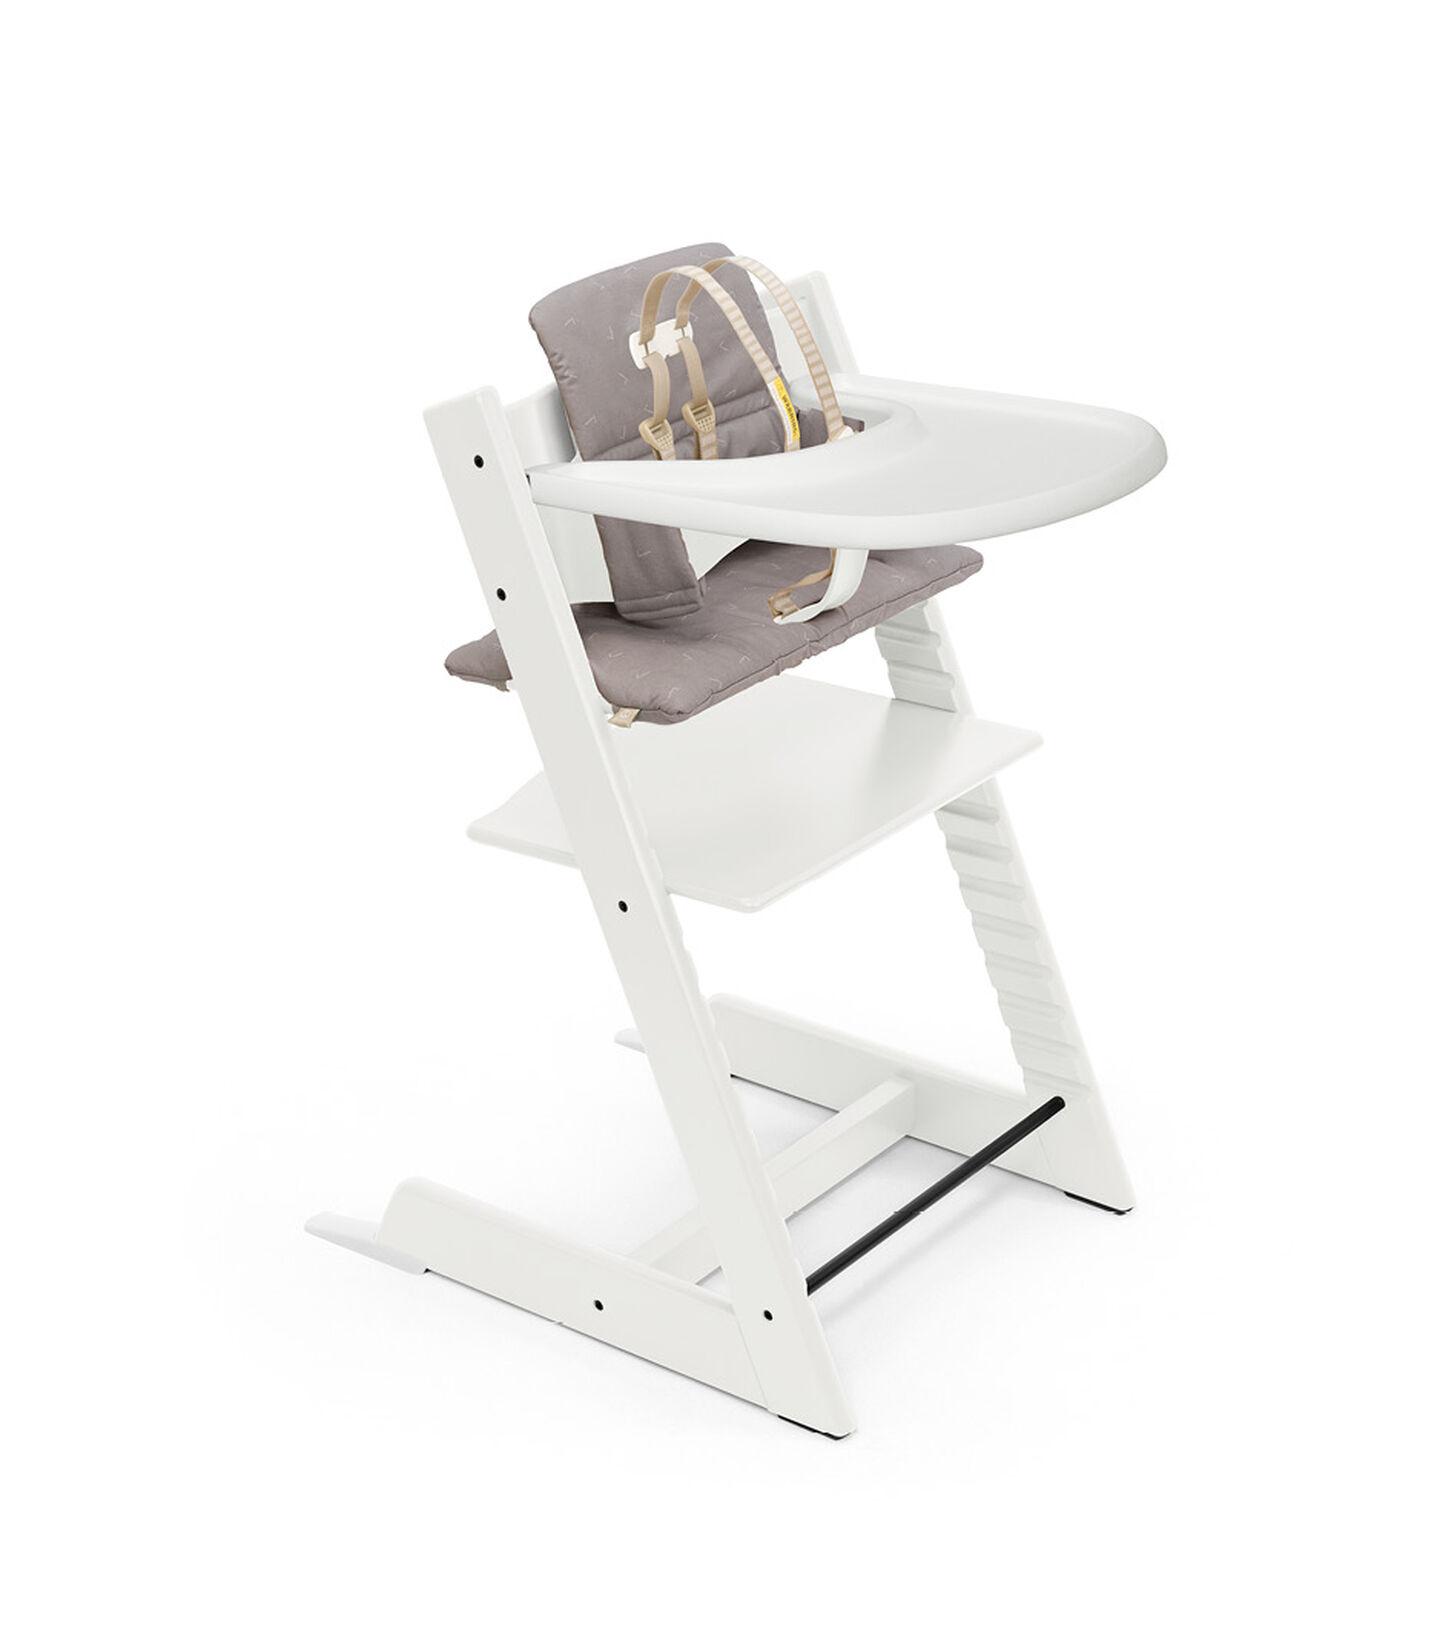 Tripp Trapp® HC Cpl White w Icon Grey Cushion & Tray, White/IconGreyCush+Tray, mainview view 2